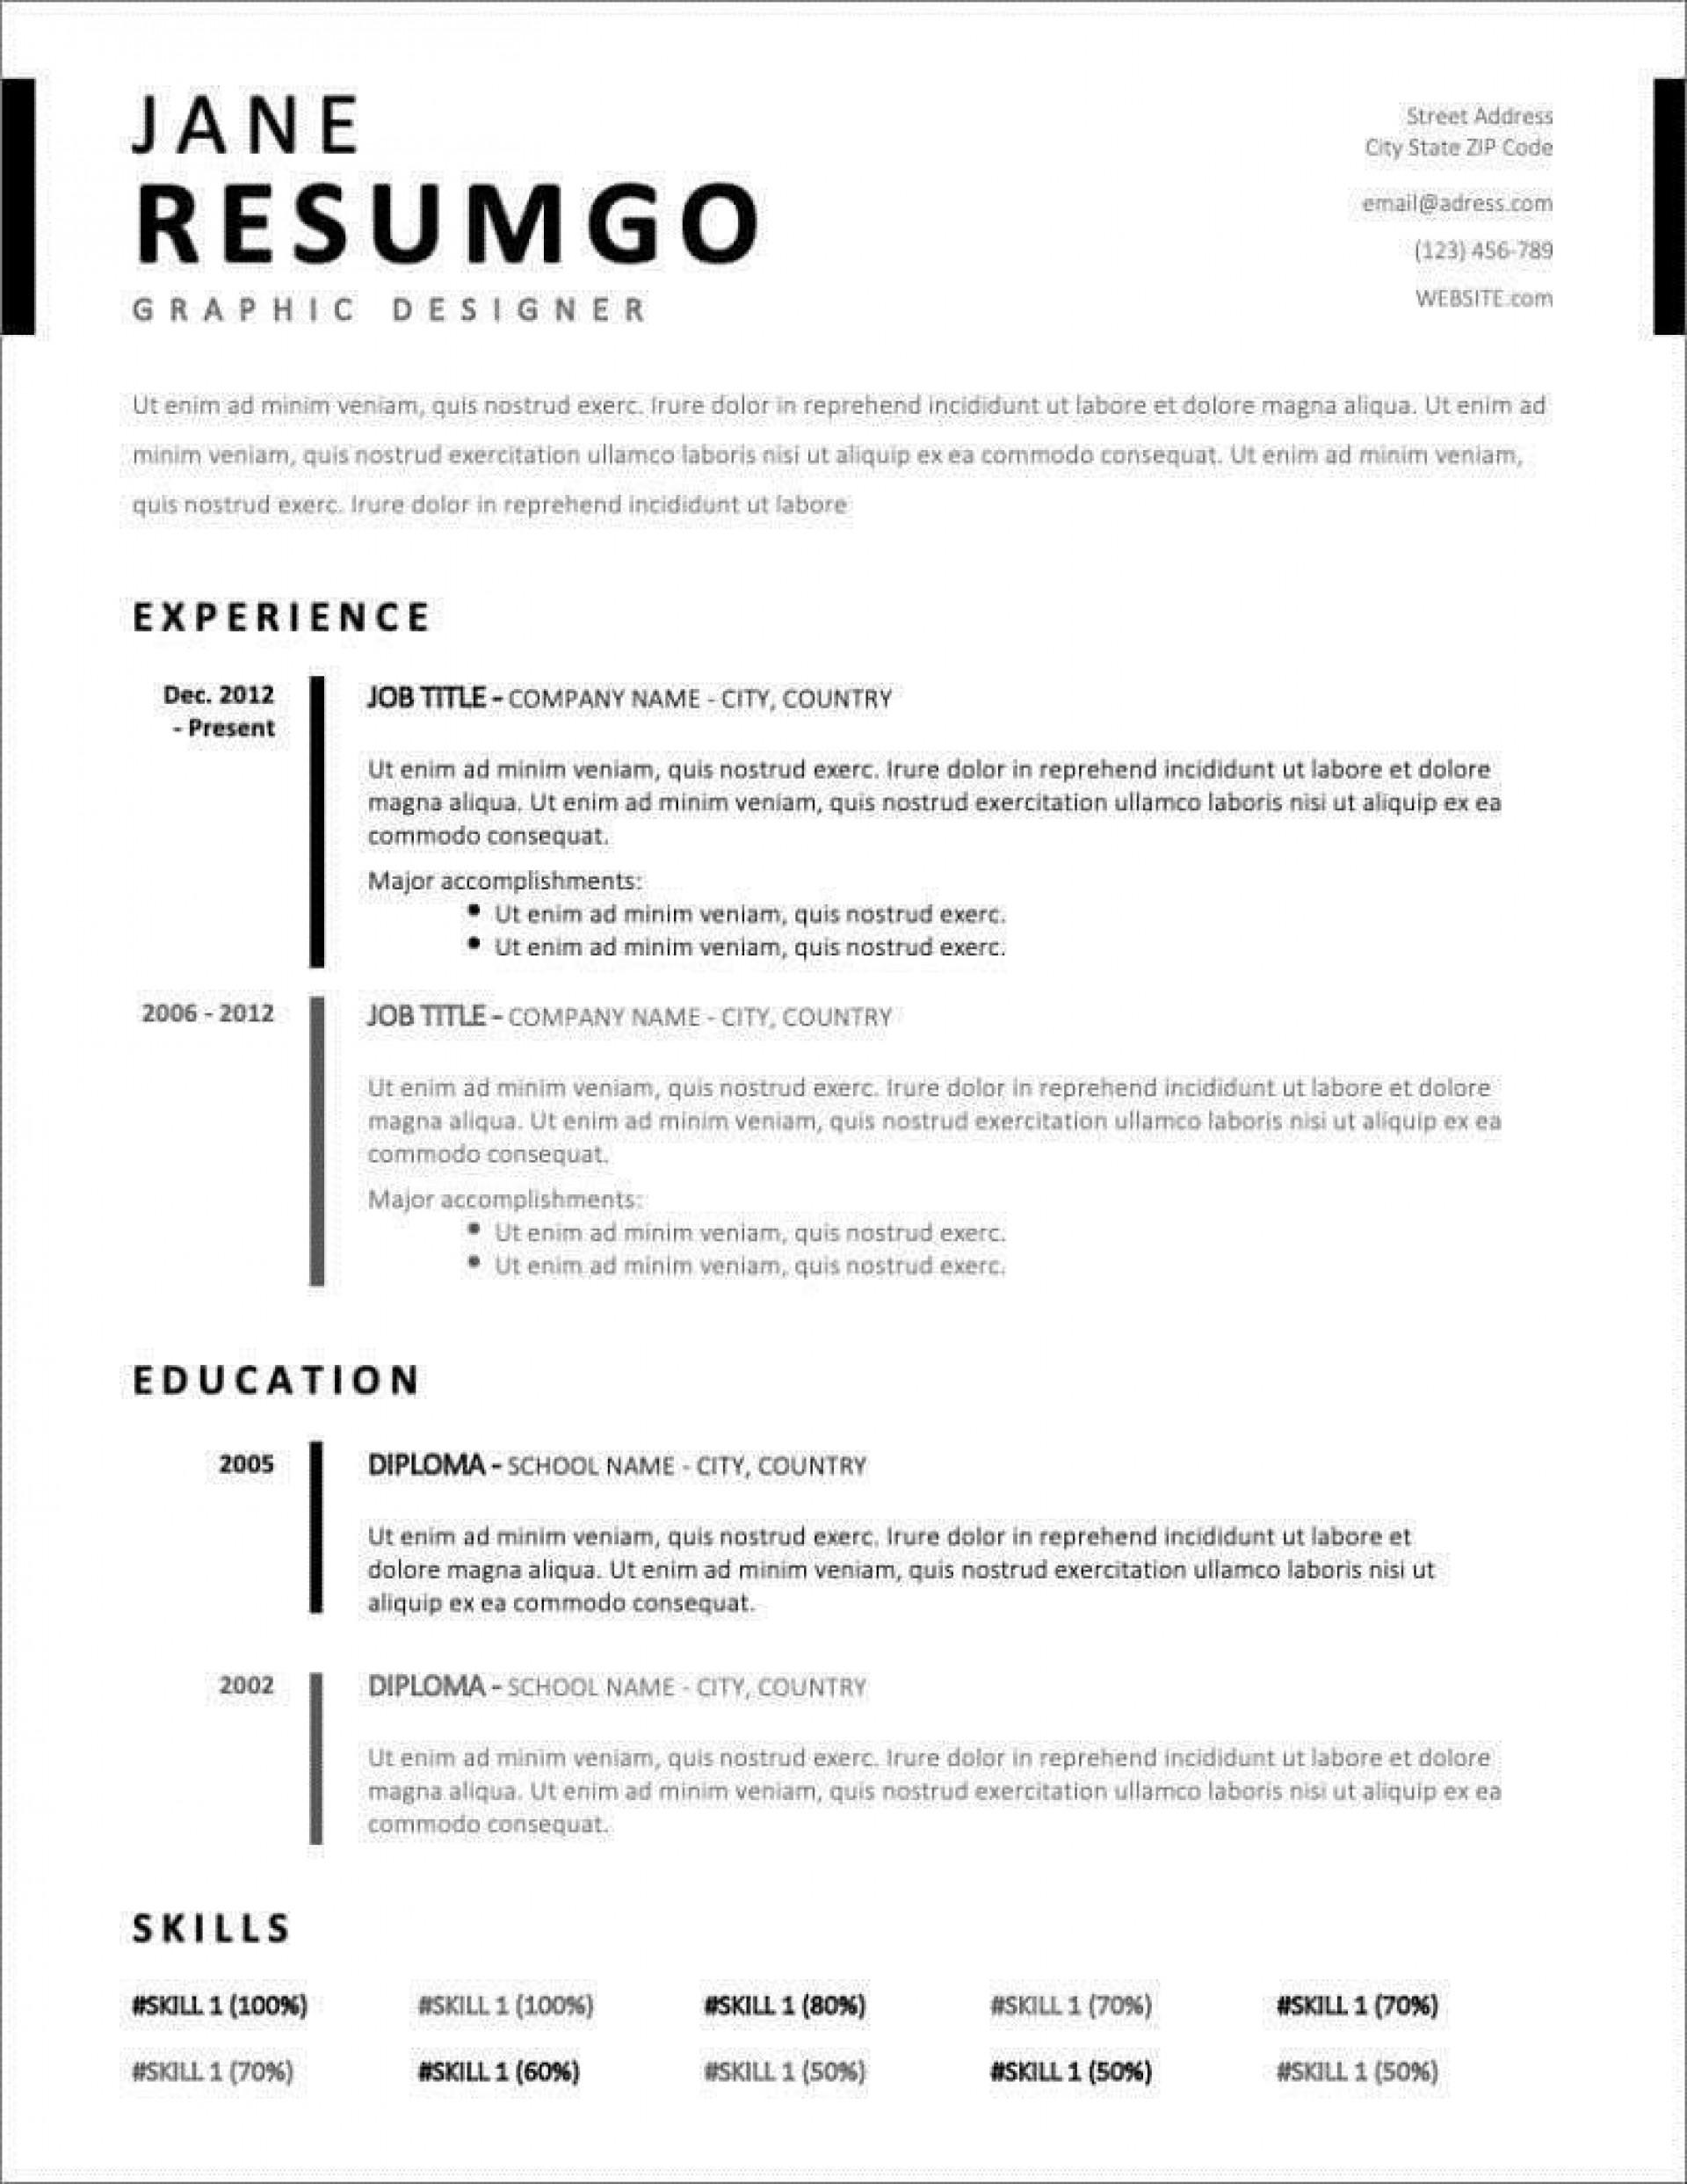 002 Fascinating Download Resume Sample Free Idea  Teacher Cv Graphic Designer Word Format Nurse Template1920